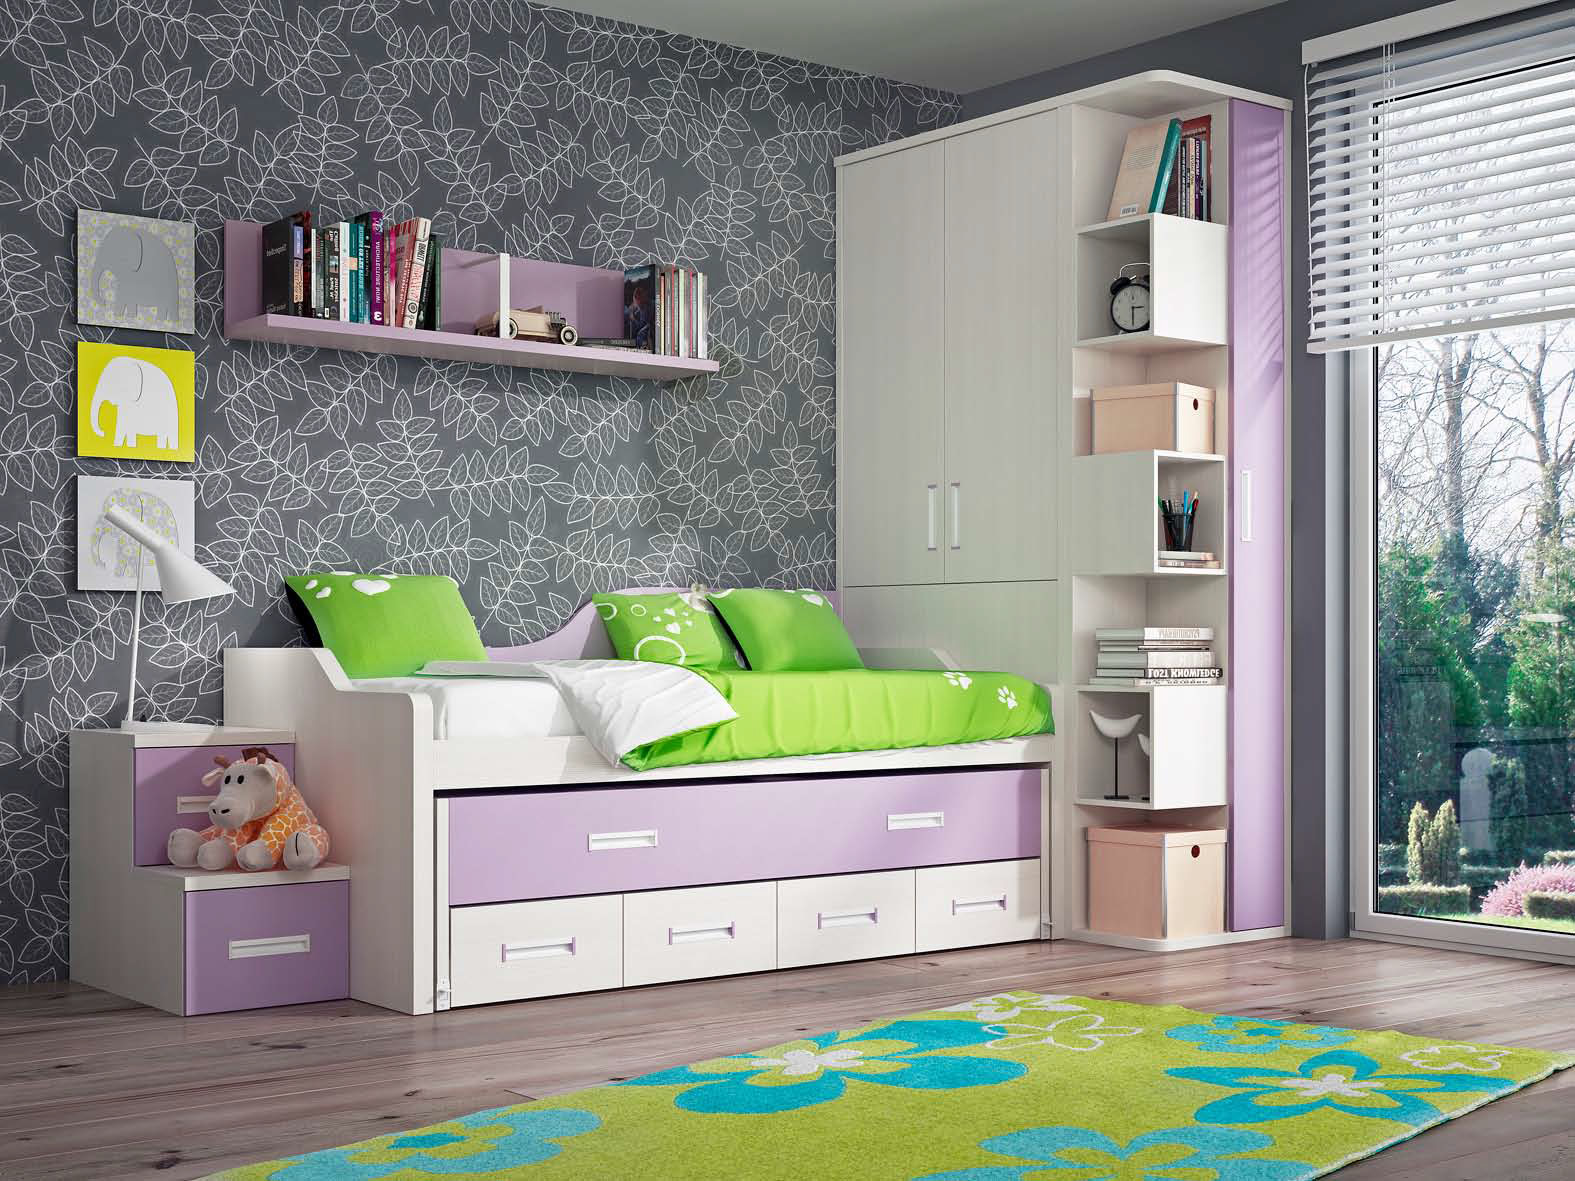 Dormitorios juveniles muebles montanaro for Catalogo de muebles juveniles